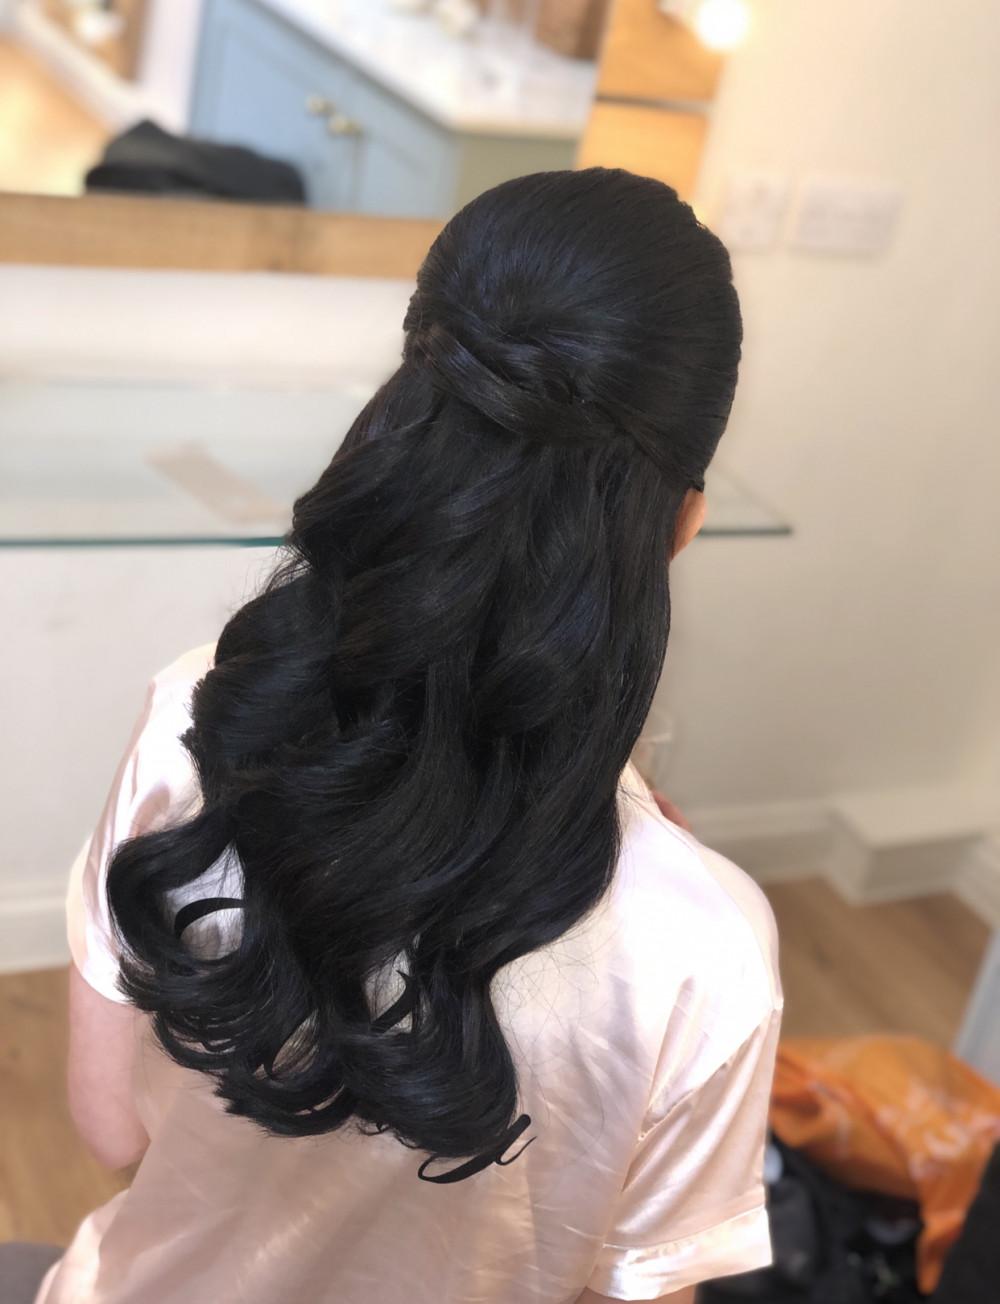 Bridal Hair at Millbridge Court in Hampshire - Make Me Bridal Artist: Suzanne Dusek Hair & Makeup.